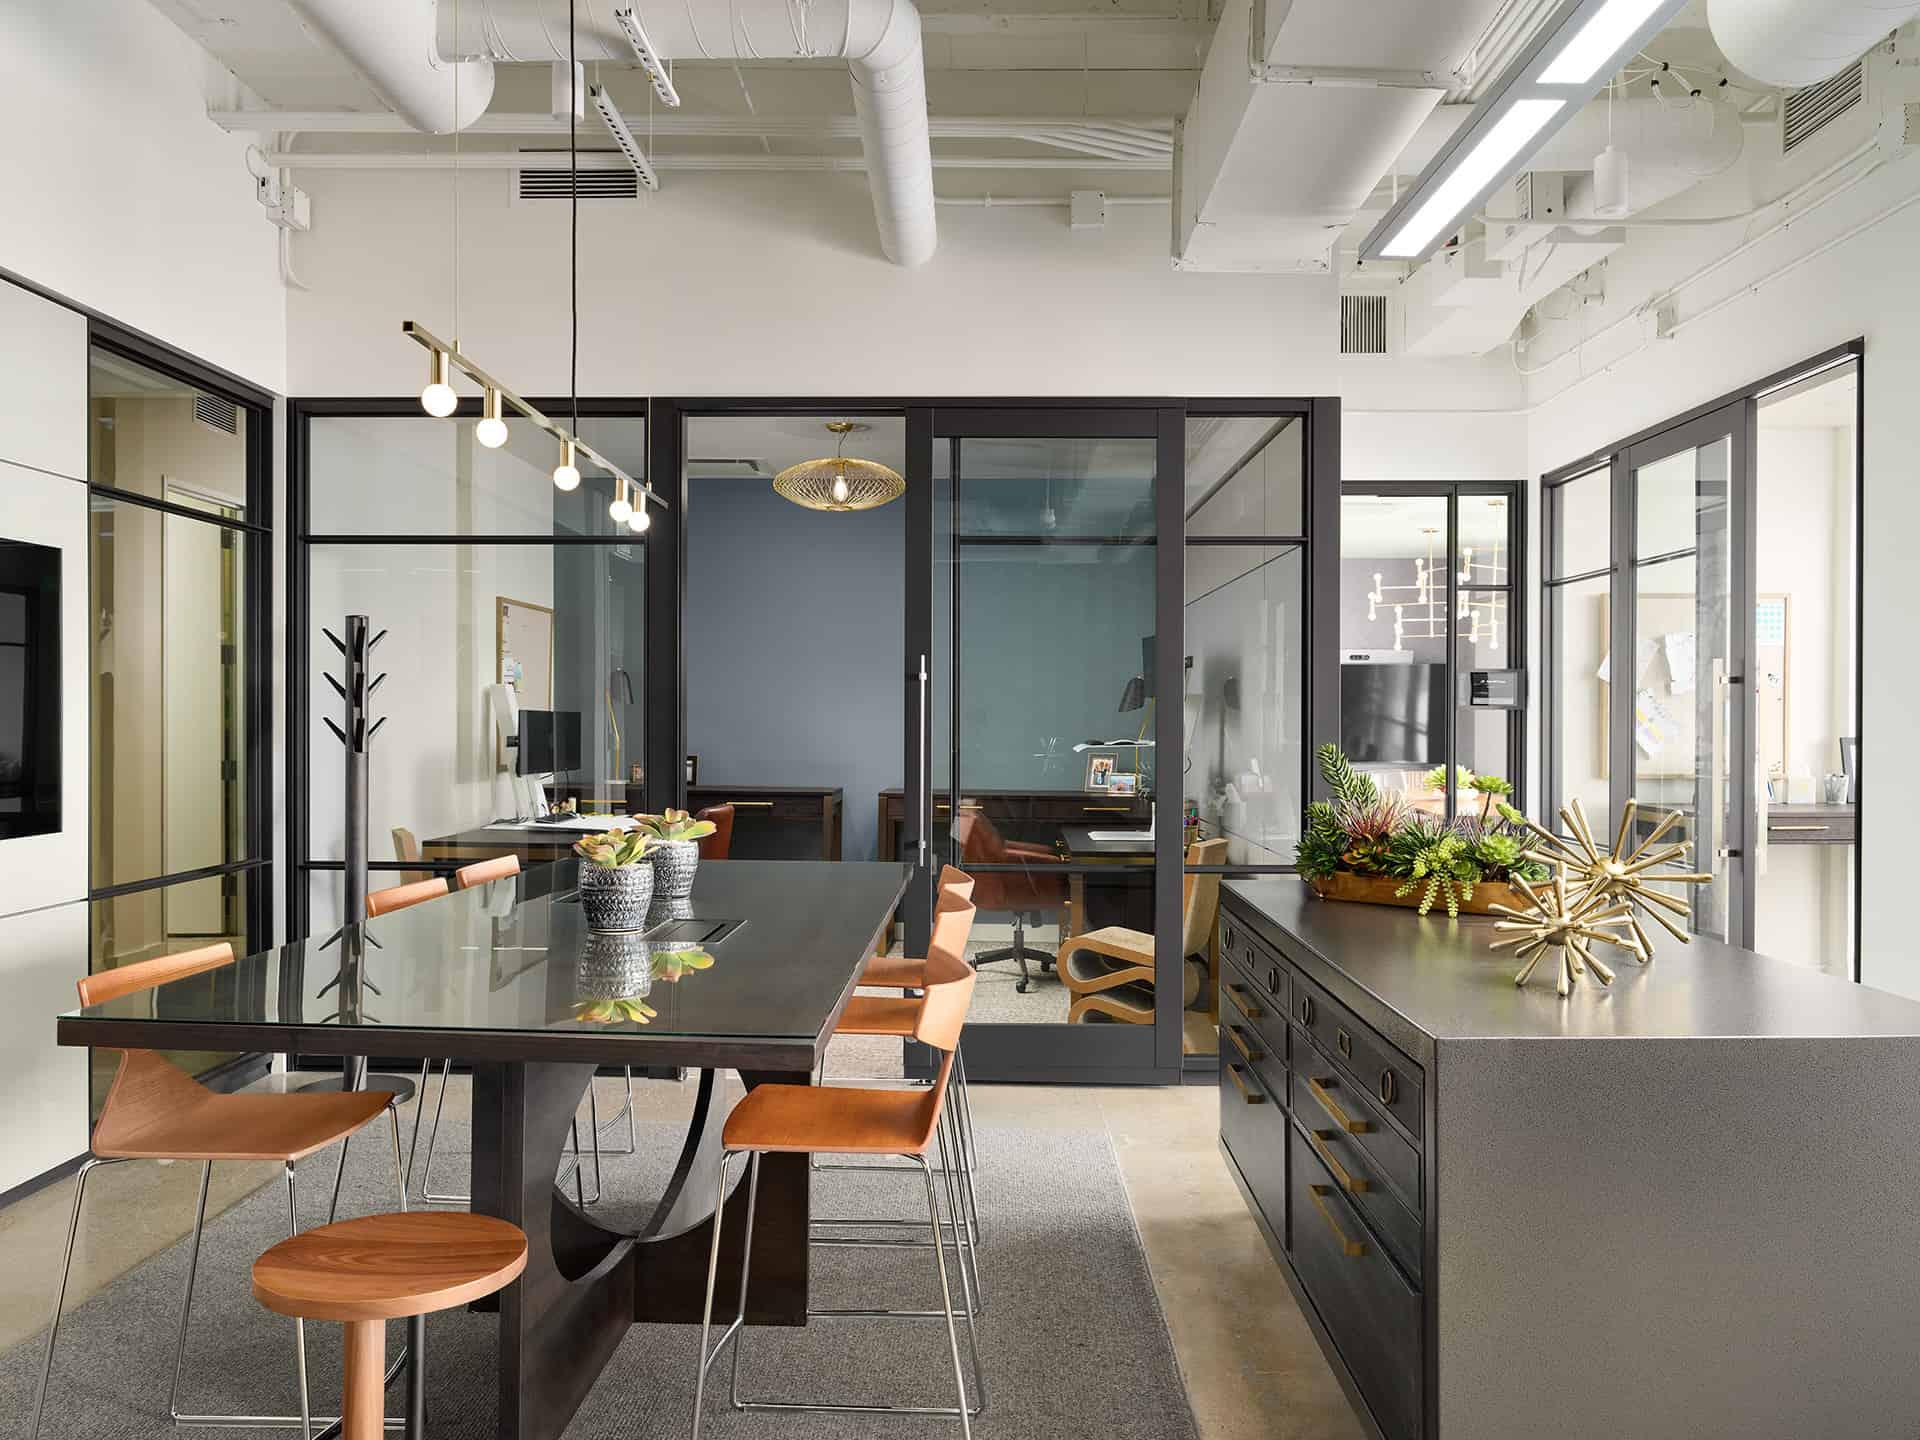 denver colorado interior designer office commercial design post pandemic office space